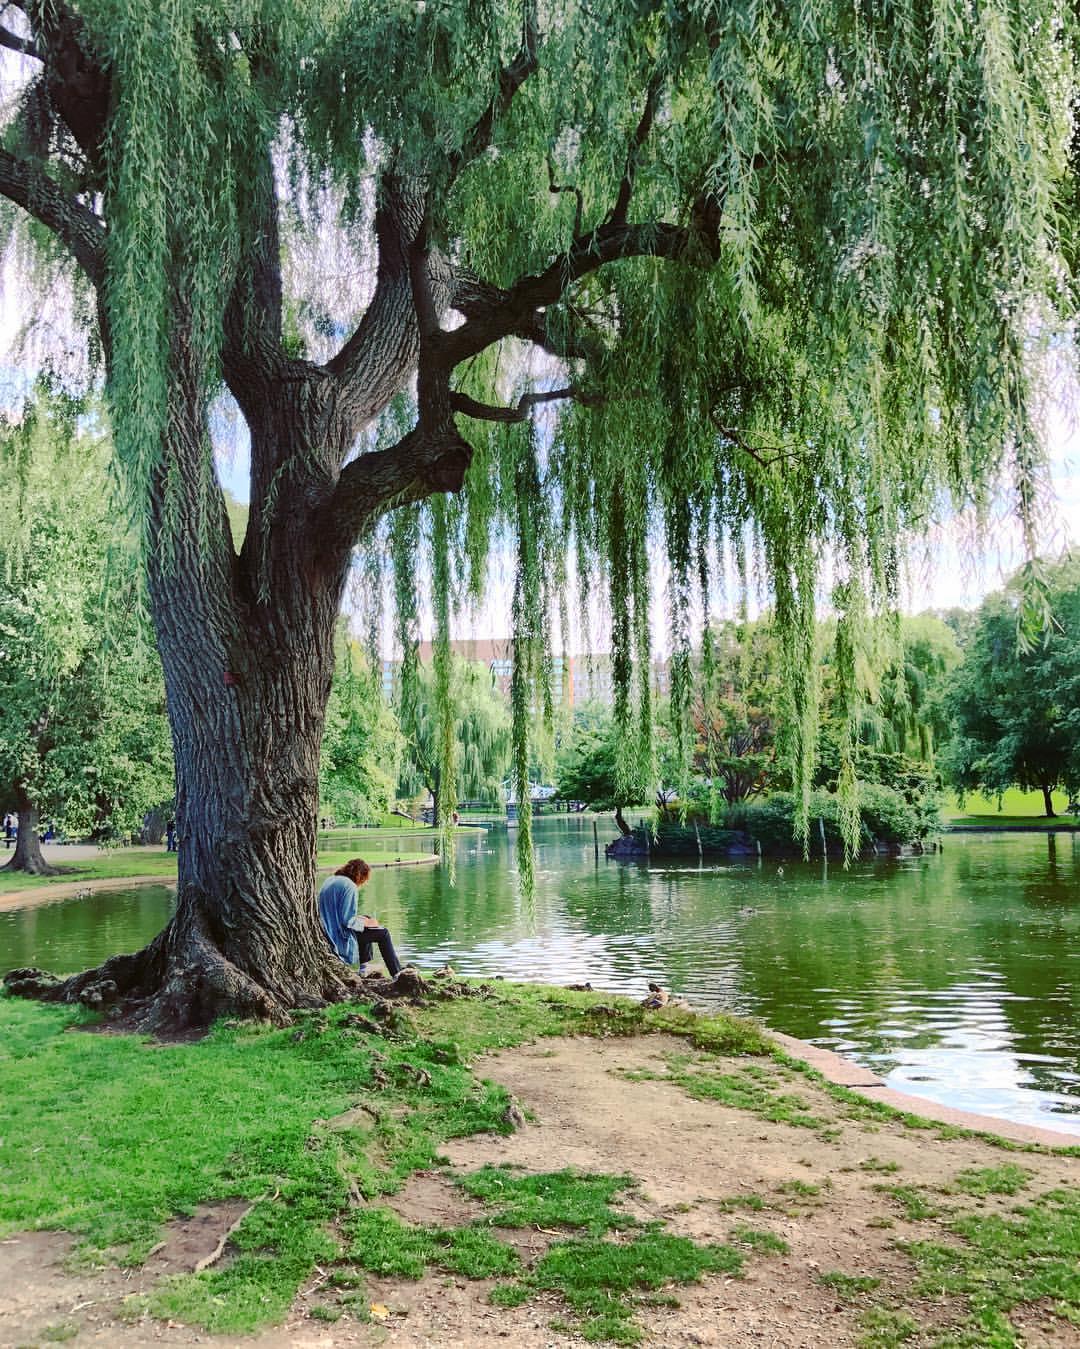 Solitude.  #Boston #nature #landscape #city #publicgarden #weepingwillow #tree #iphone7plus #hdr